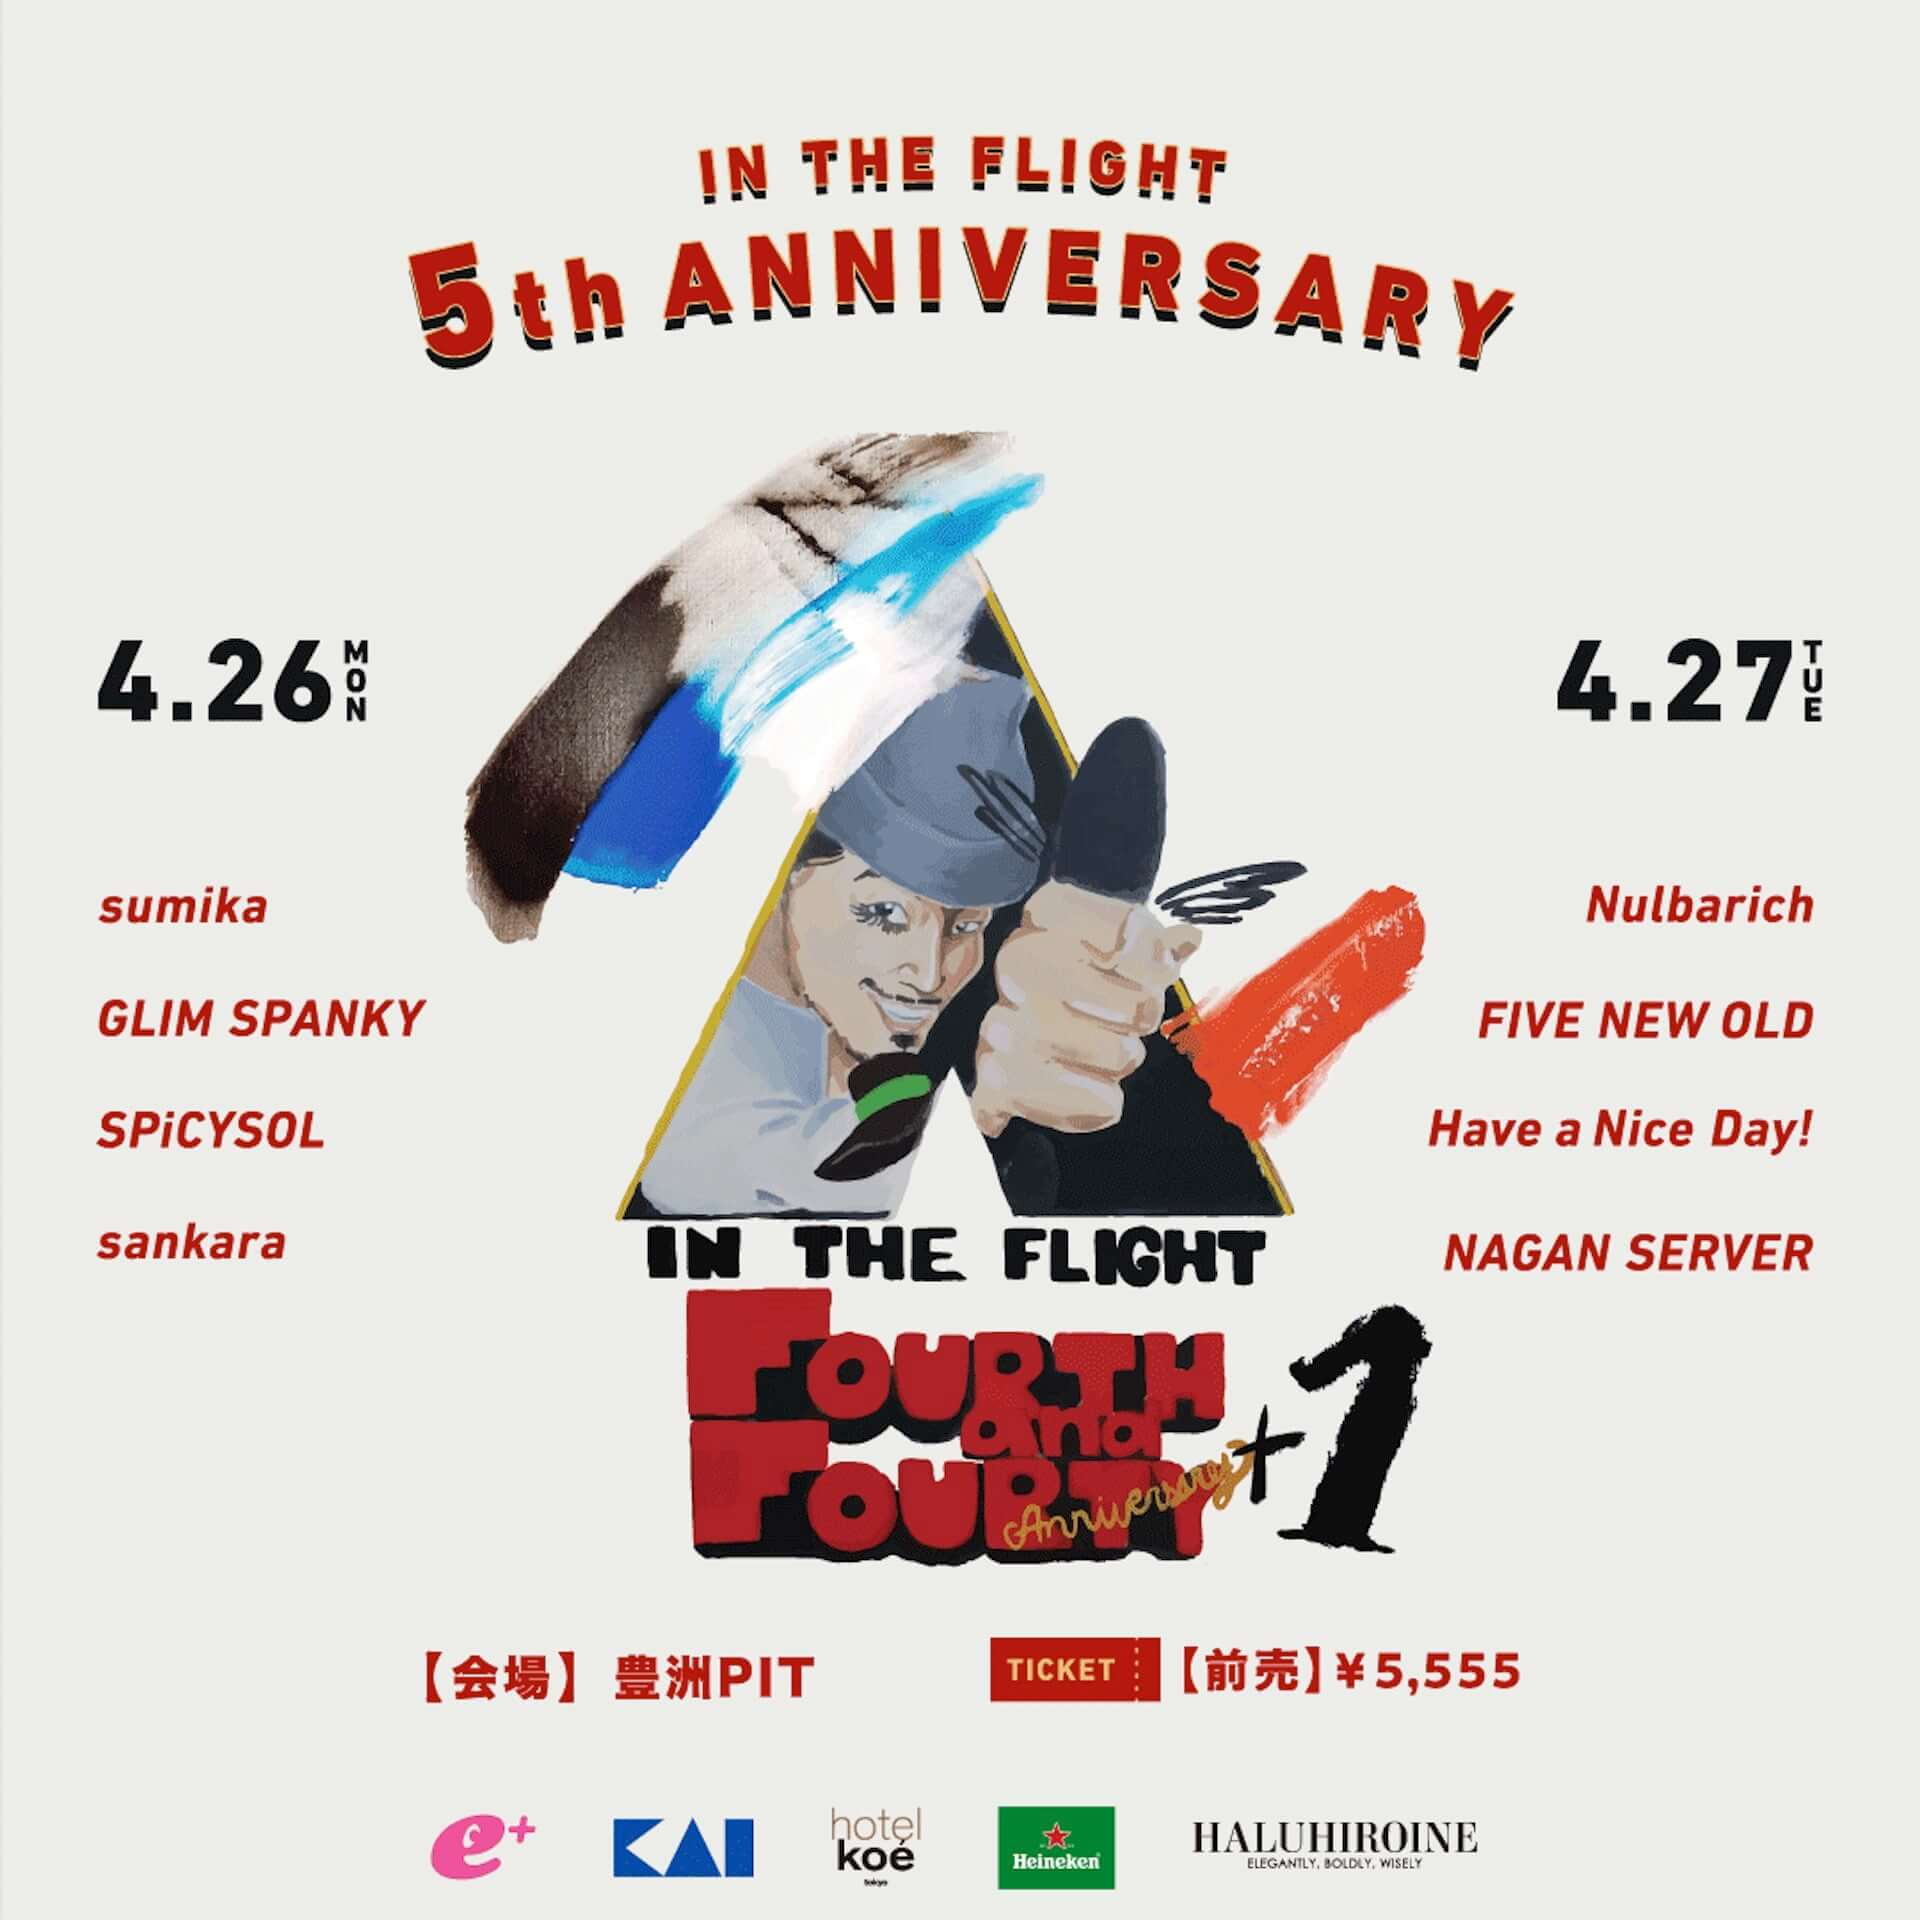 IN THE FLIGHTの5周年記念イベントにsumikaが出演決定!プレイベントには空音、ASOBOiSM、RUNG HYANGらが登場 music210324_intheflight5th_5-1920x1920